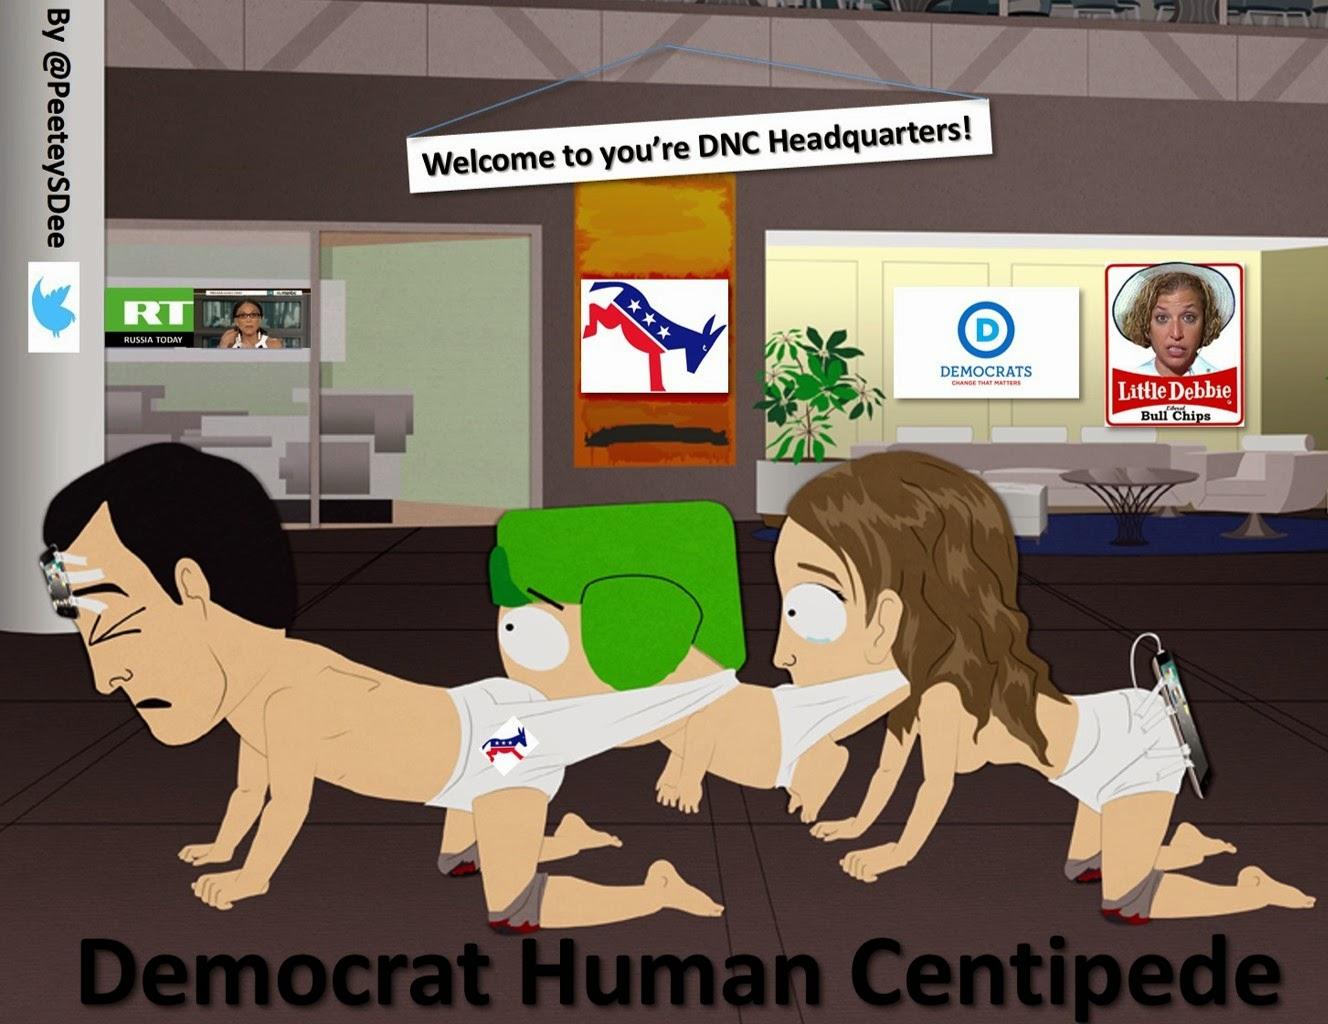 Democrat Human Centipede